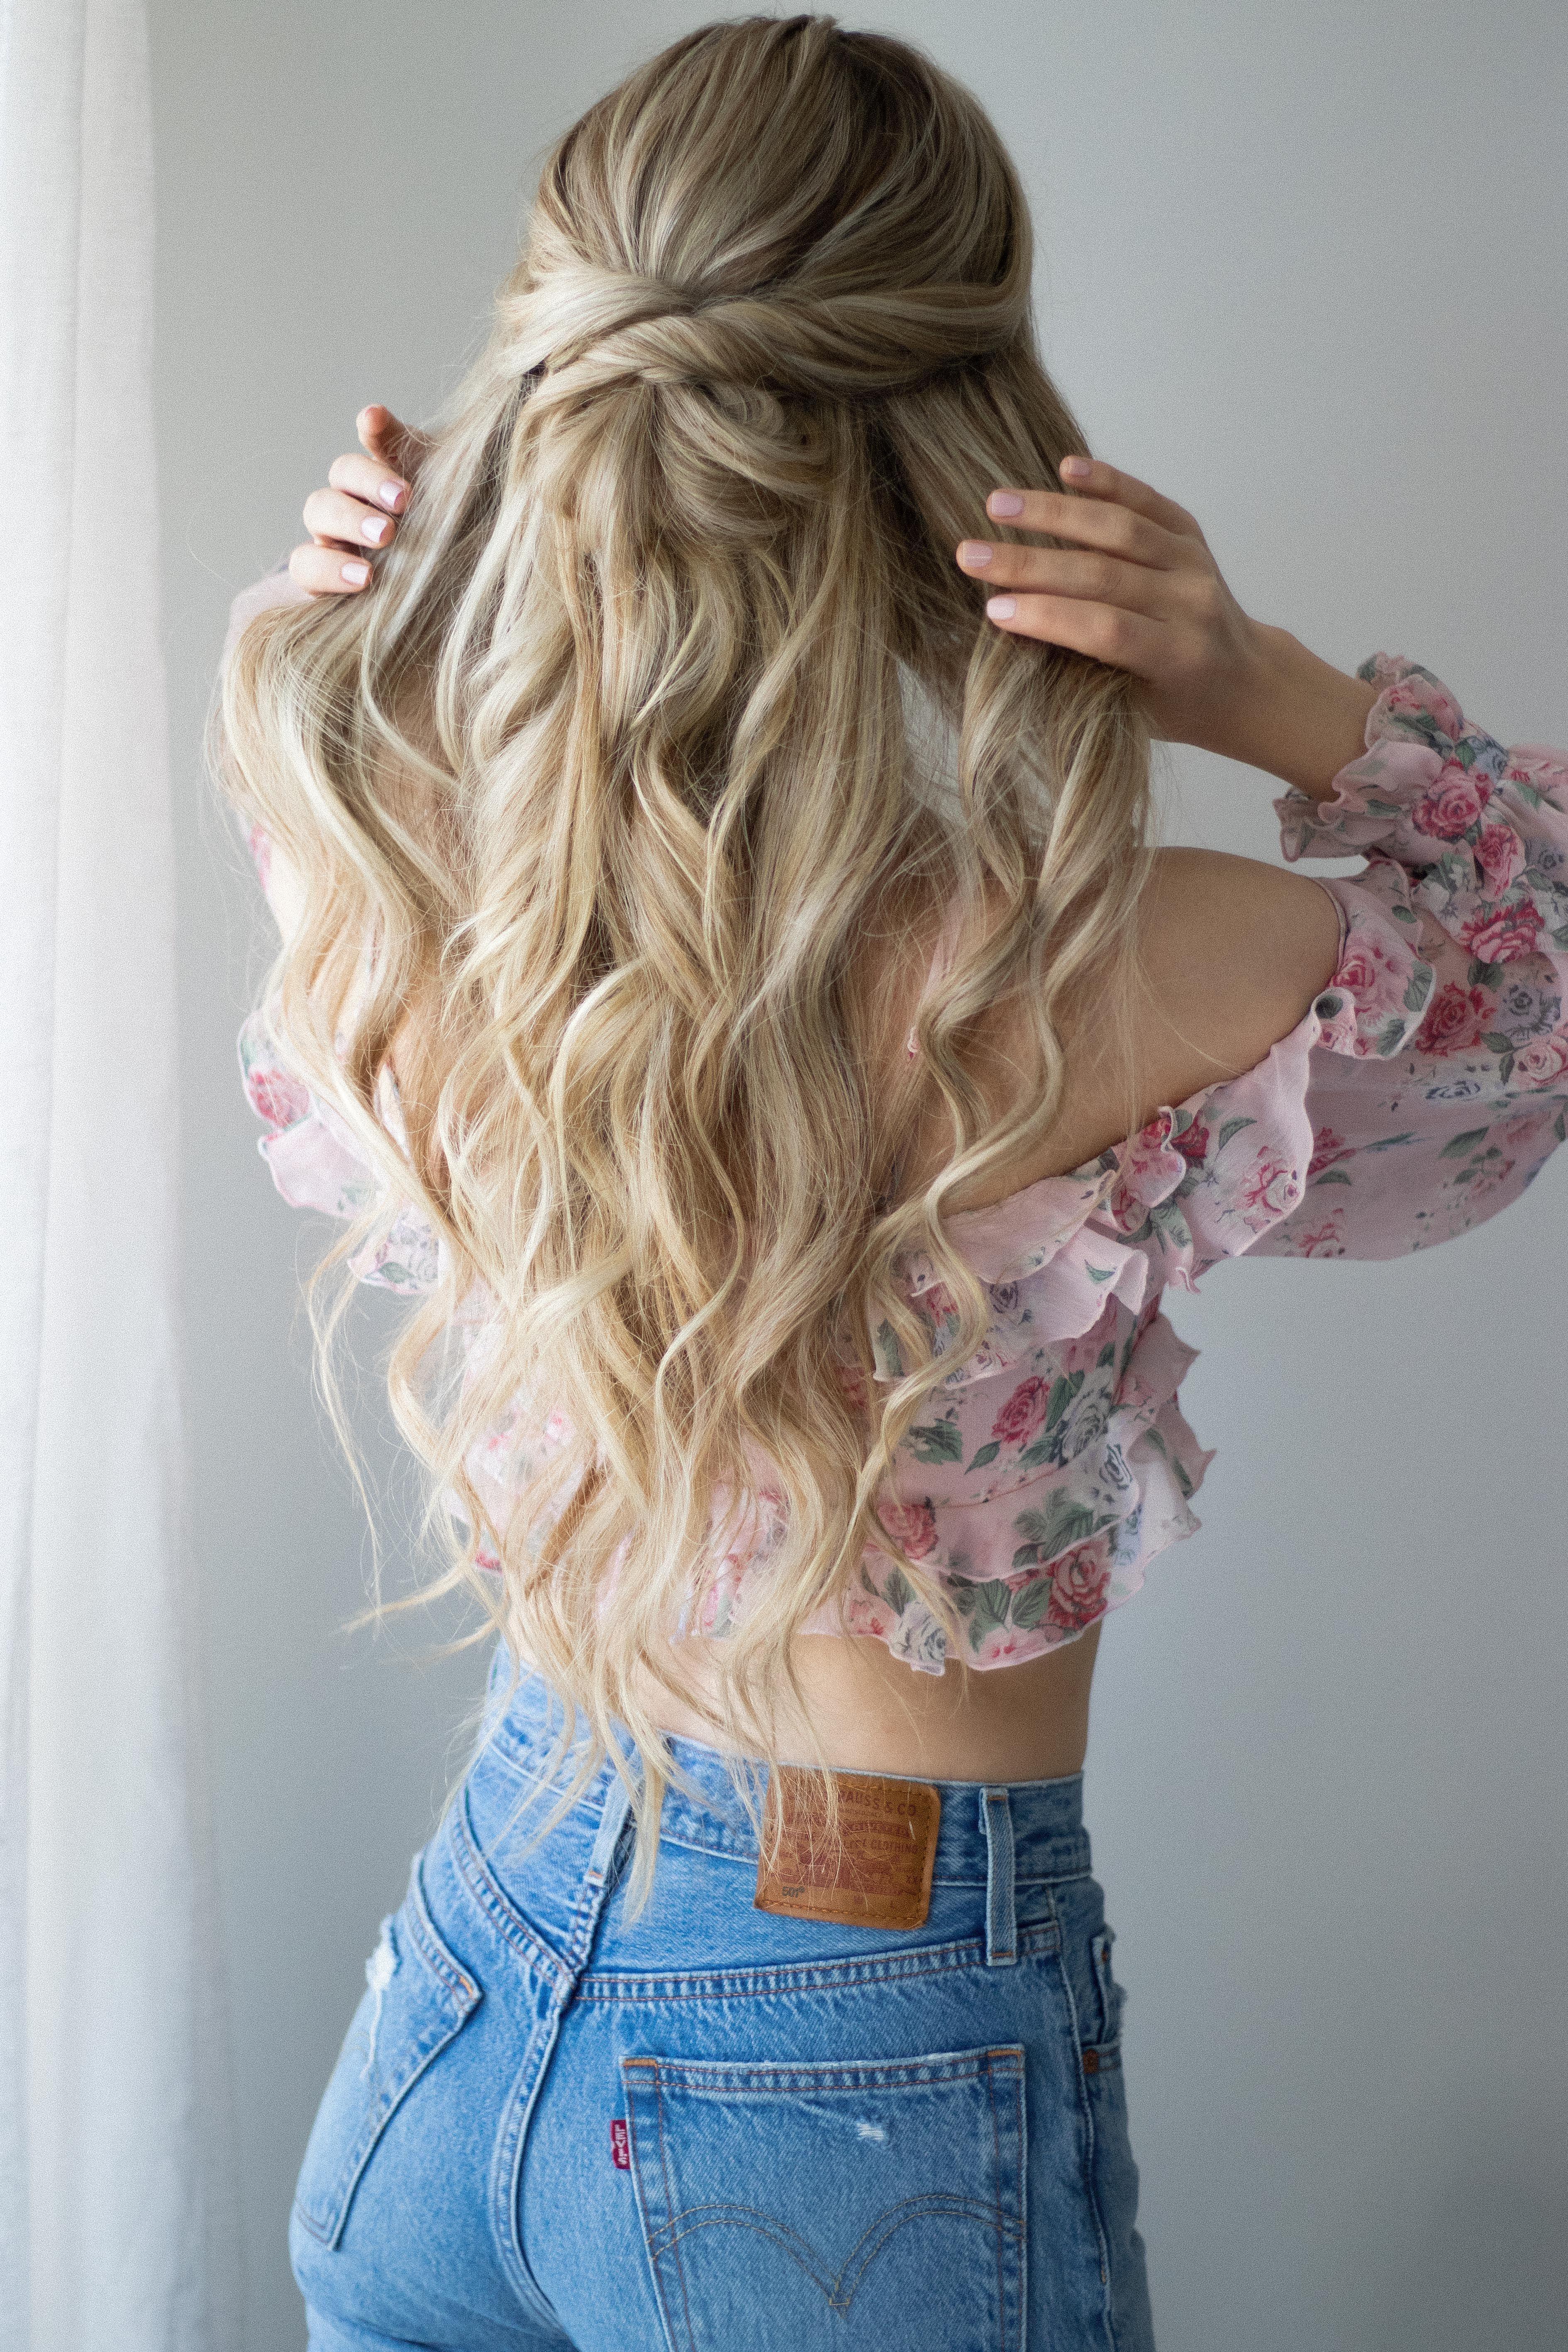 3 Easy Summer Hairstyles for 2019 - #hairstyles #summer - #hairstyleFormal in 2020   Summer ...